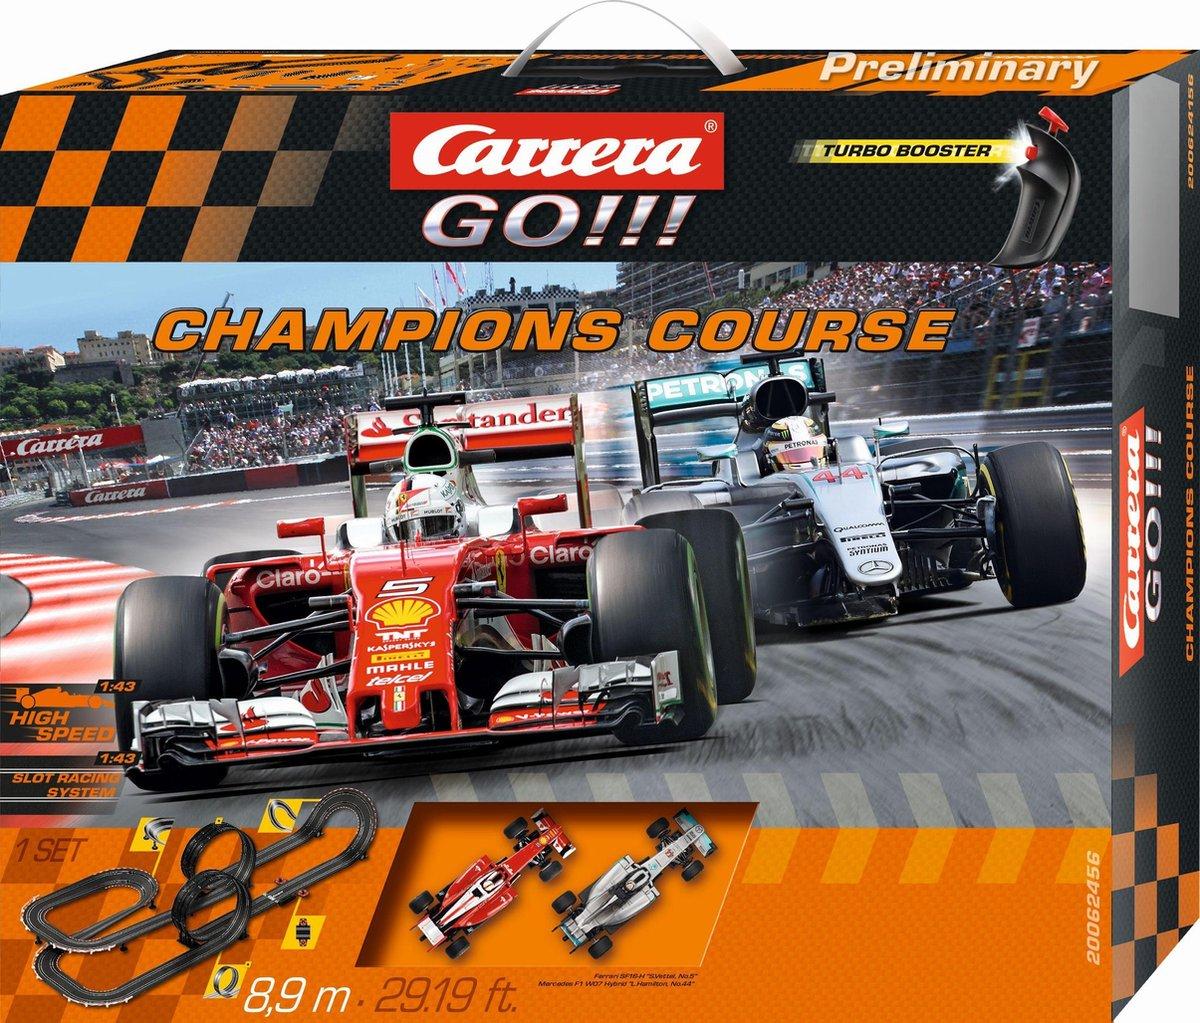 Carrera GO!!! Champions Course - Racebaan